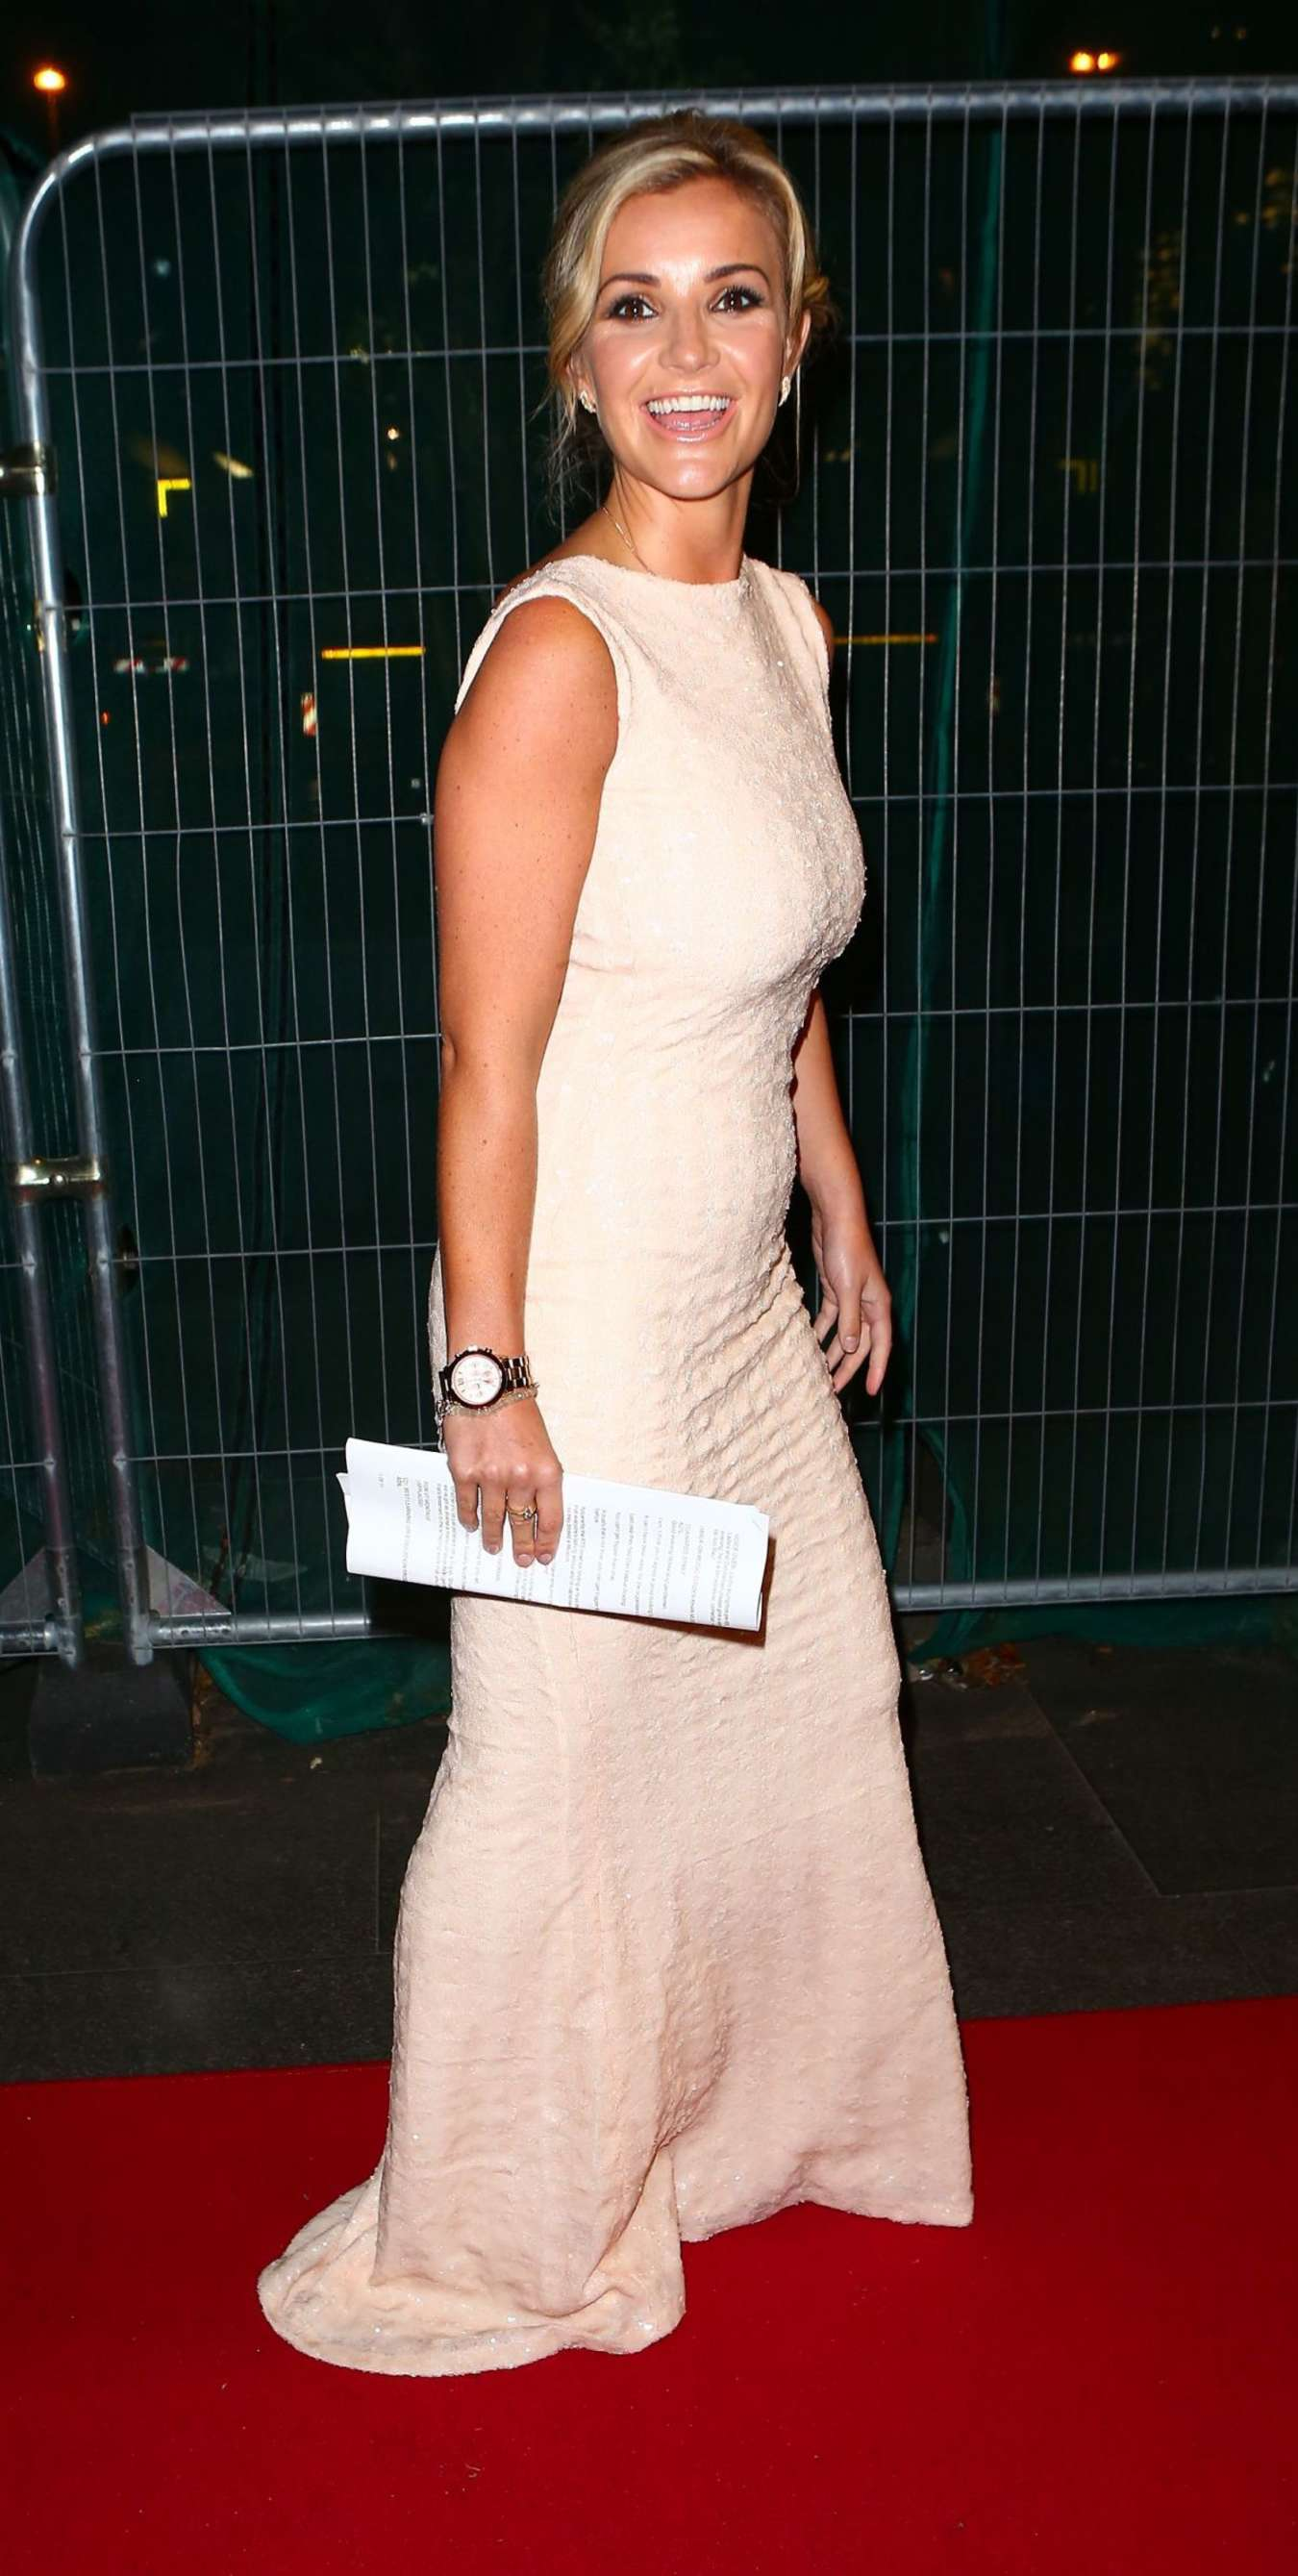 Helen Skelton RTS Awards in Manchester